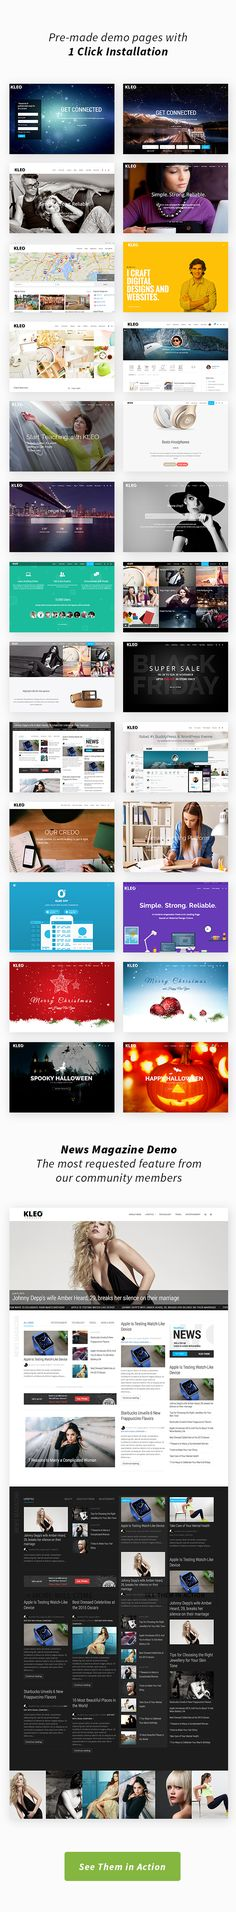 bbpress, bootstrap, buddypress, clean design, community theme, customizer, drag&drop, e-commerce theme, multi-purpose, post formats, responsive design, retina ready, social network, woocommerce, wordpress theme